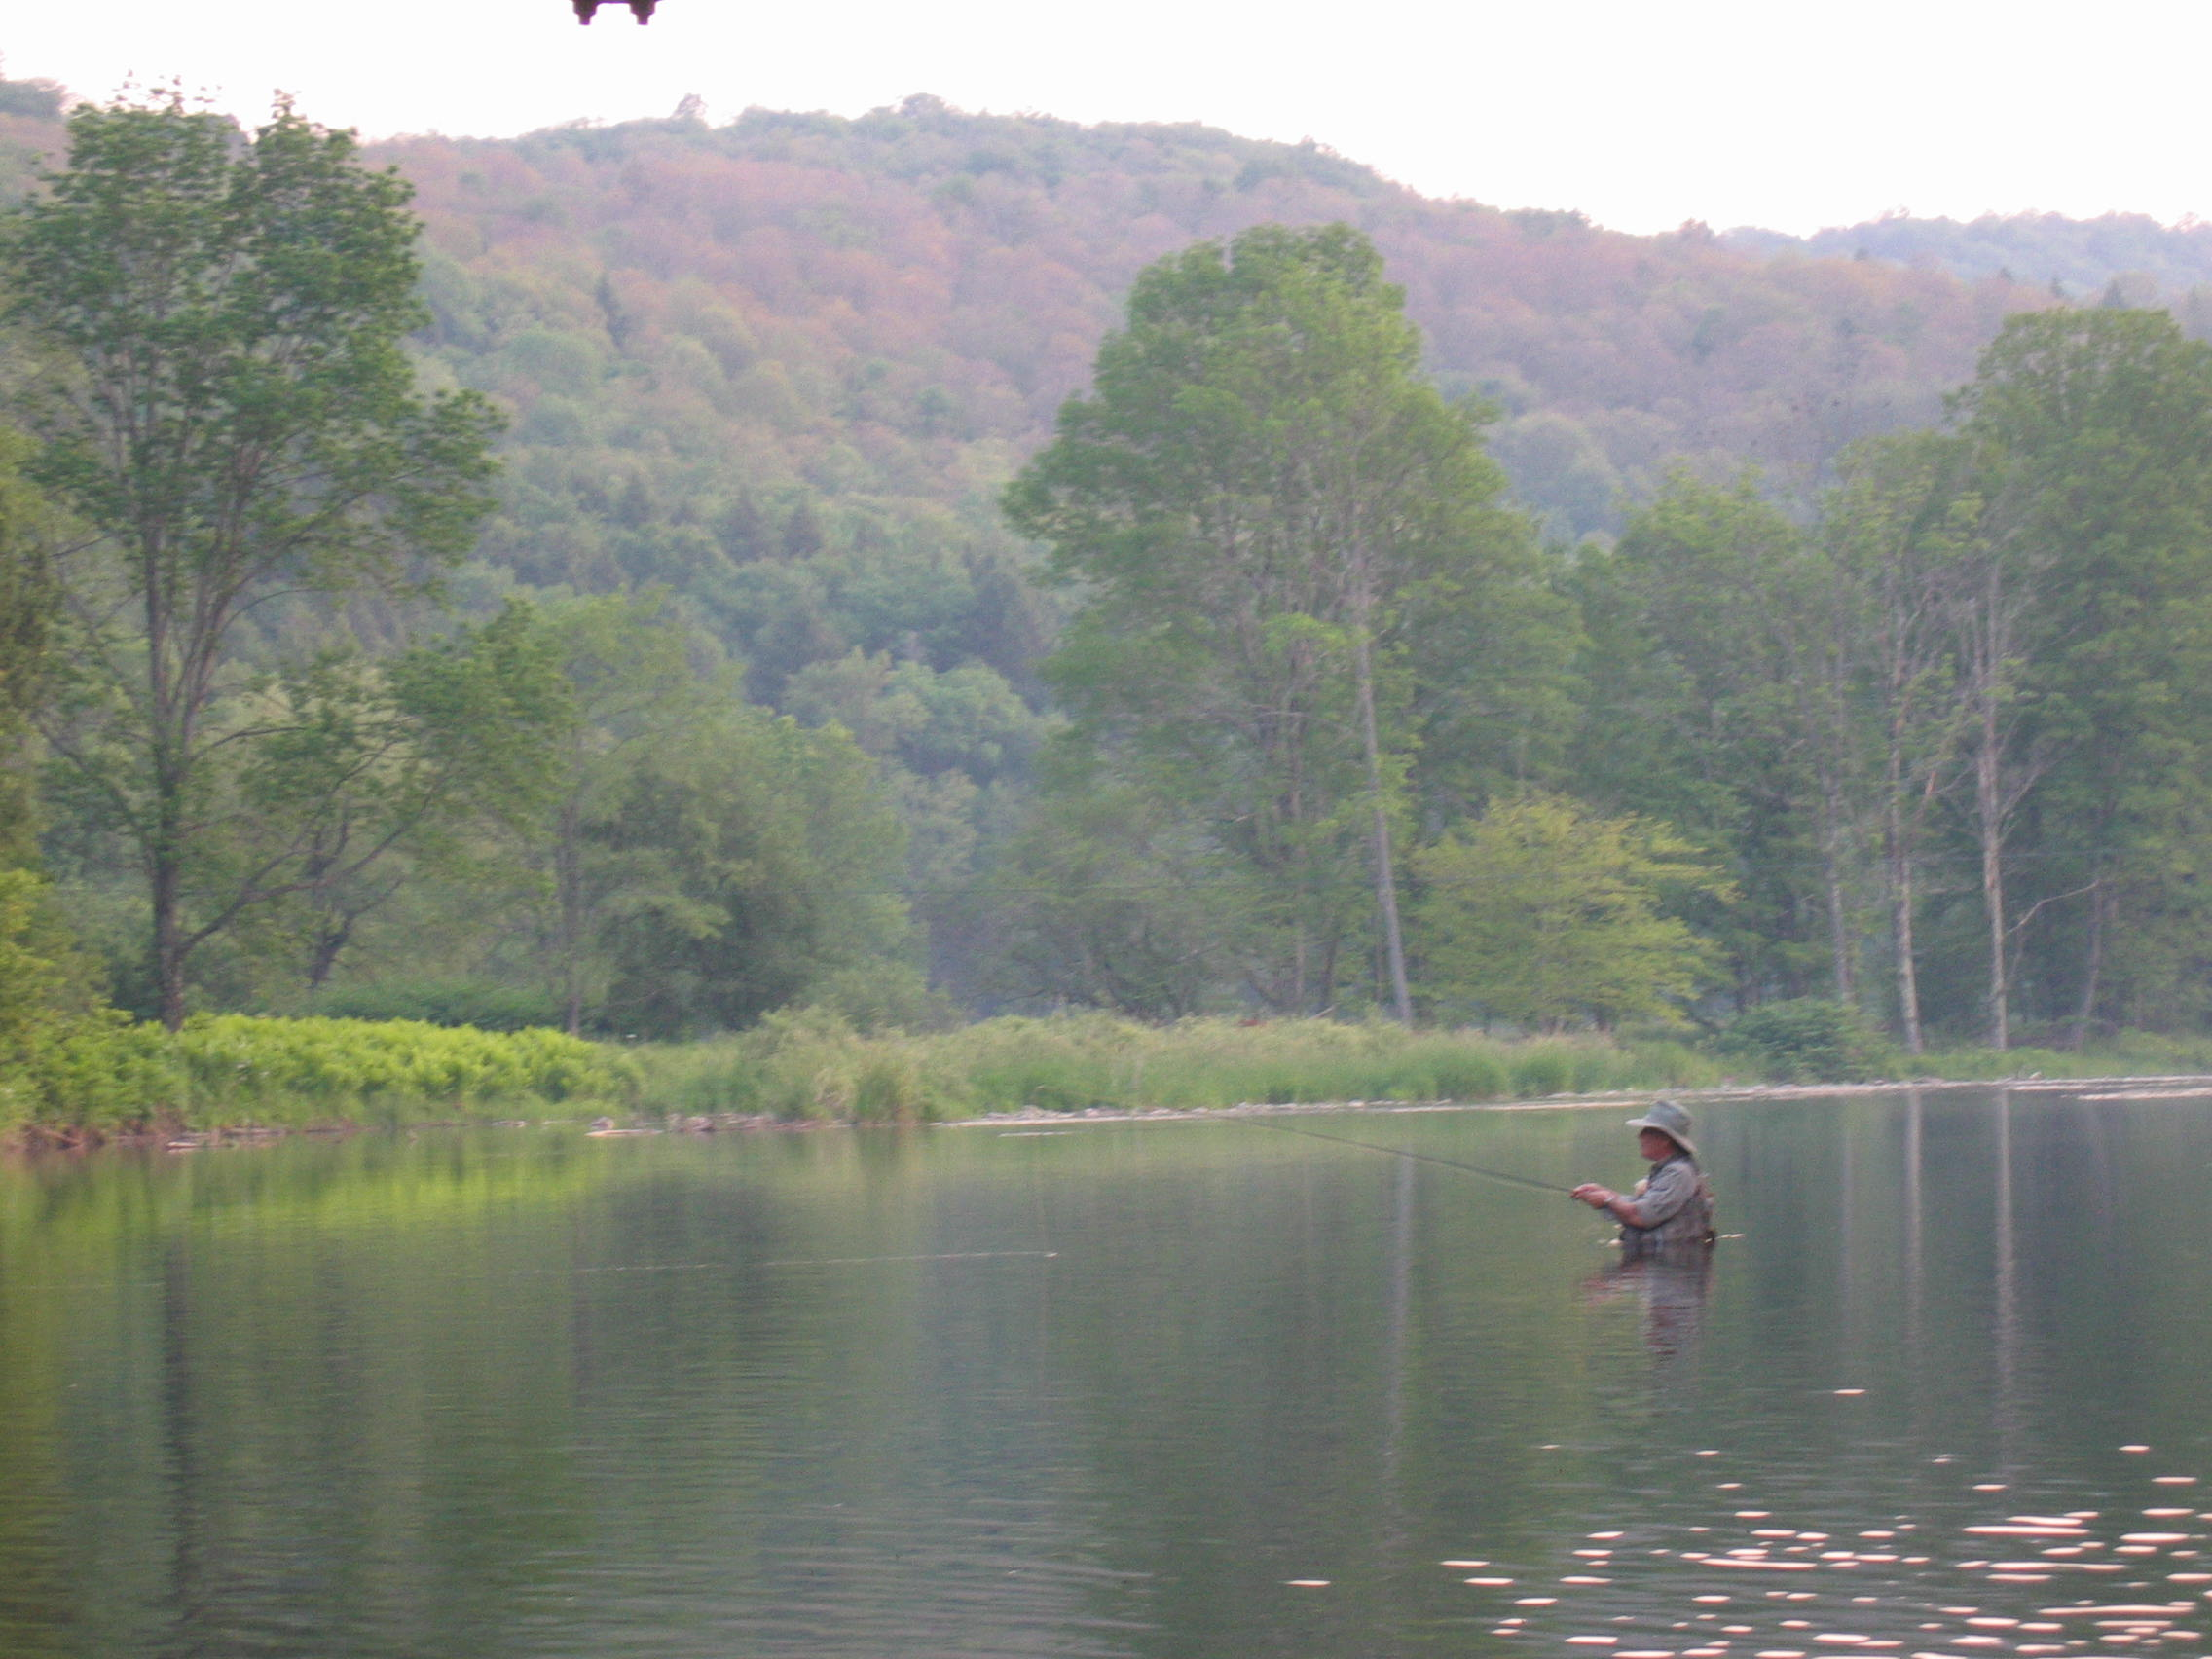 Fly fishing the Beaverkill River